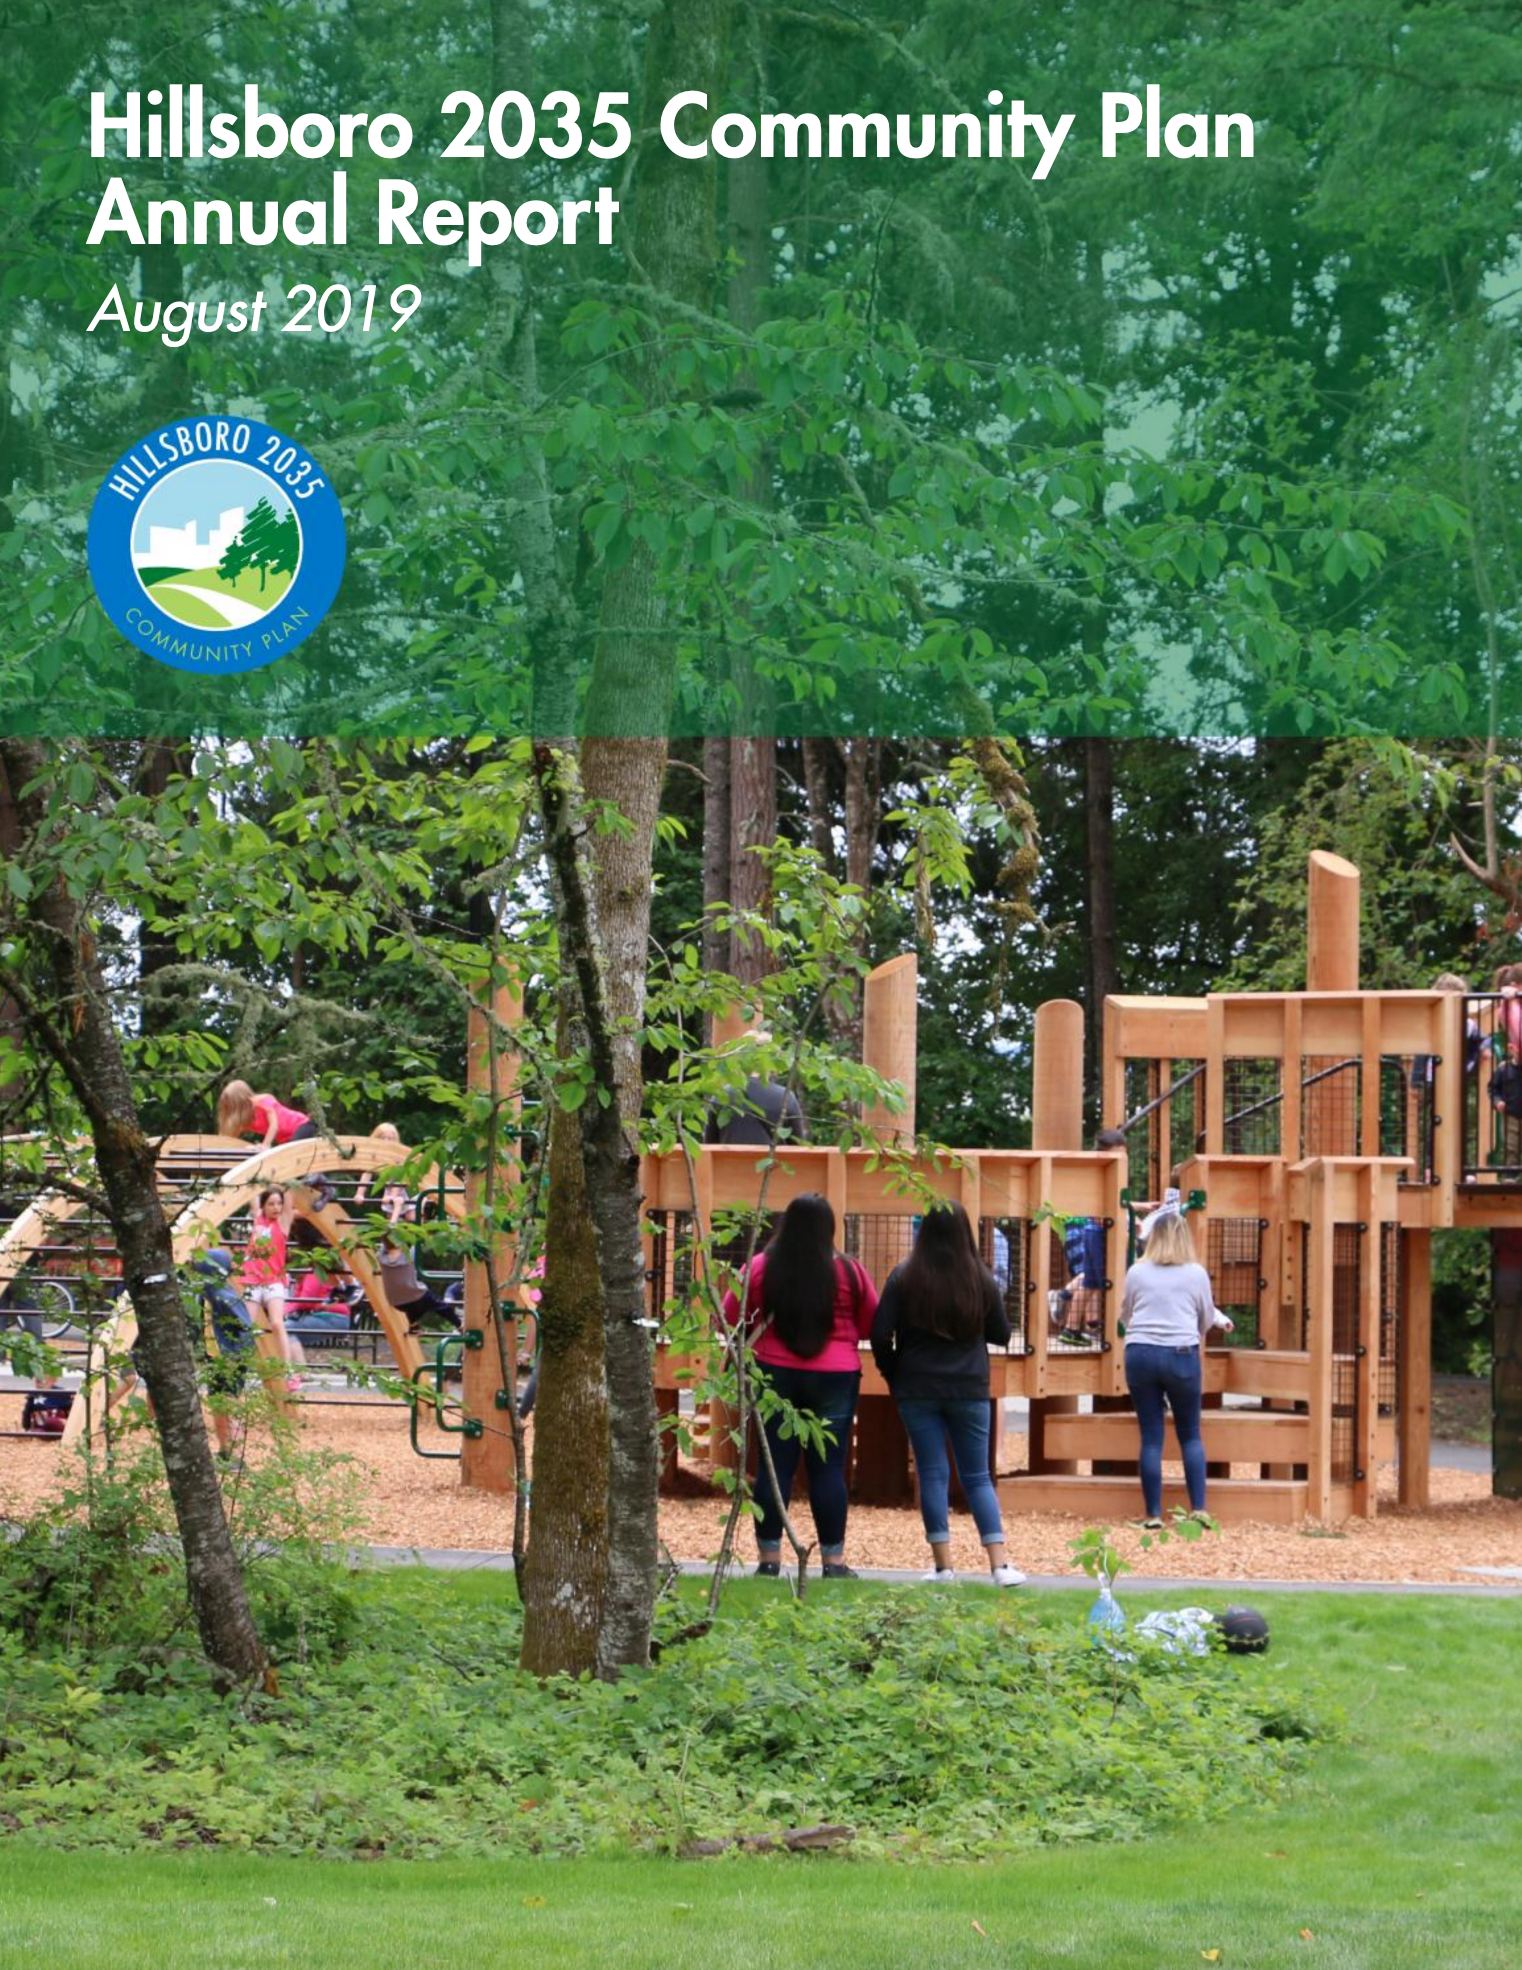 Hillsboro 2035 Community Plan Annual Report 2019 Cover